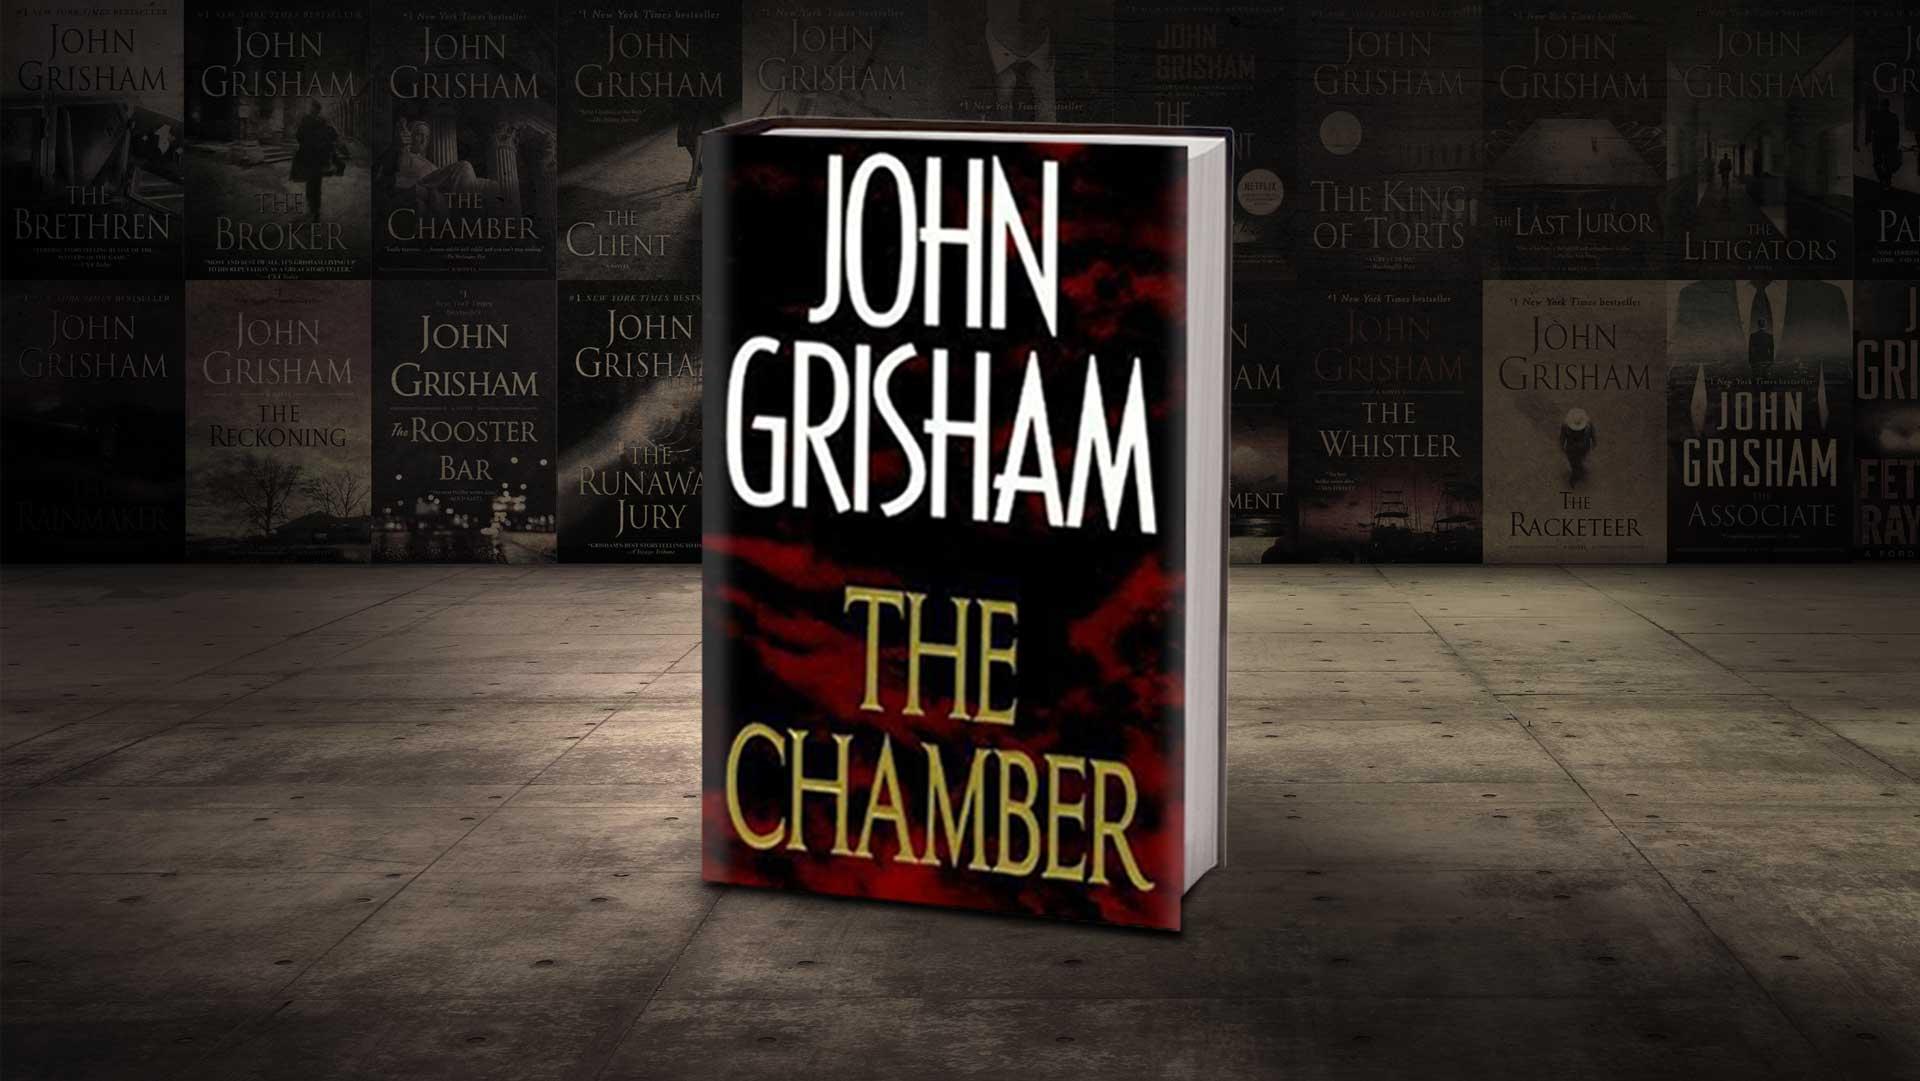 The Chanber - John Grisham